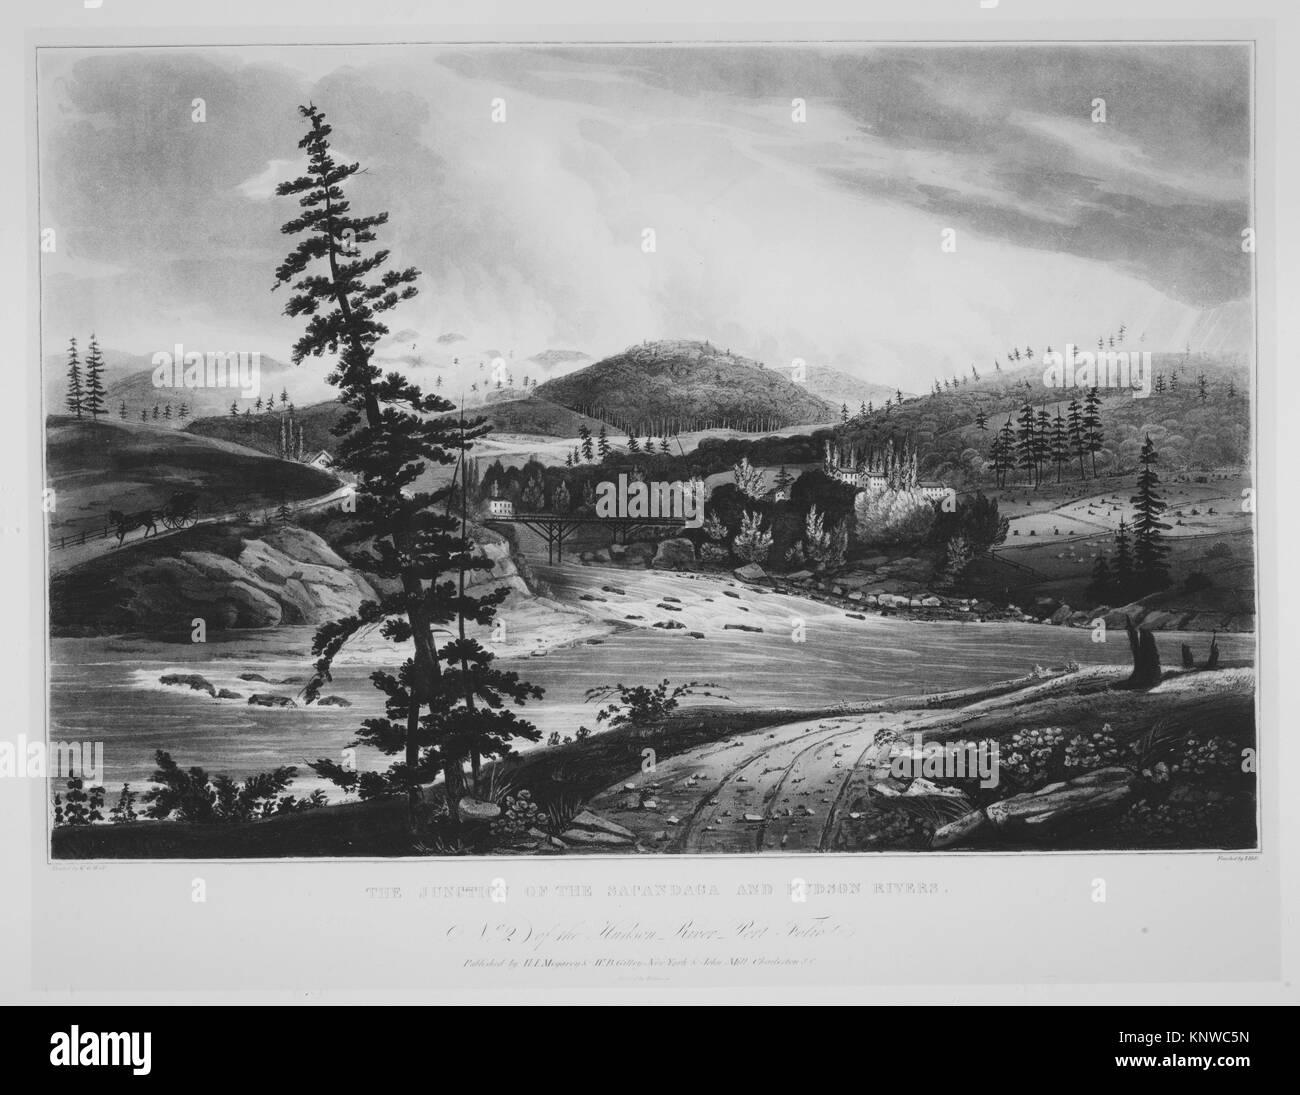 Junction of the Sacandaga and Hudson Rivers (No. 2 of The Hudson River Portfolio). Series/Portfolio: The Hudson - Stock Image